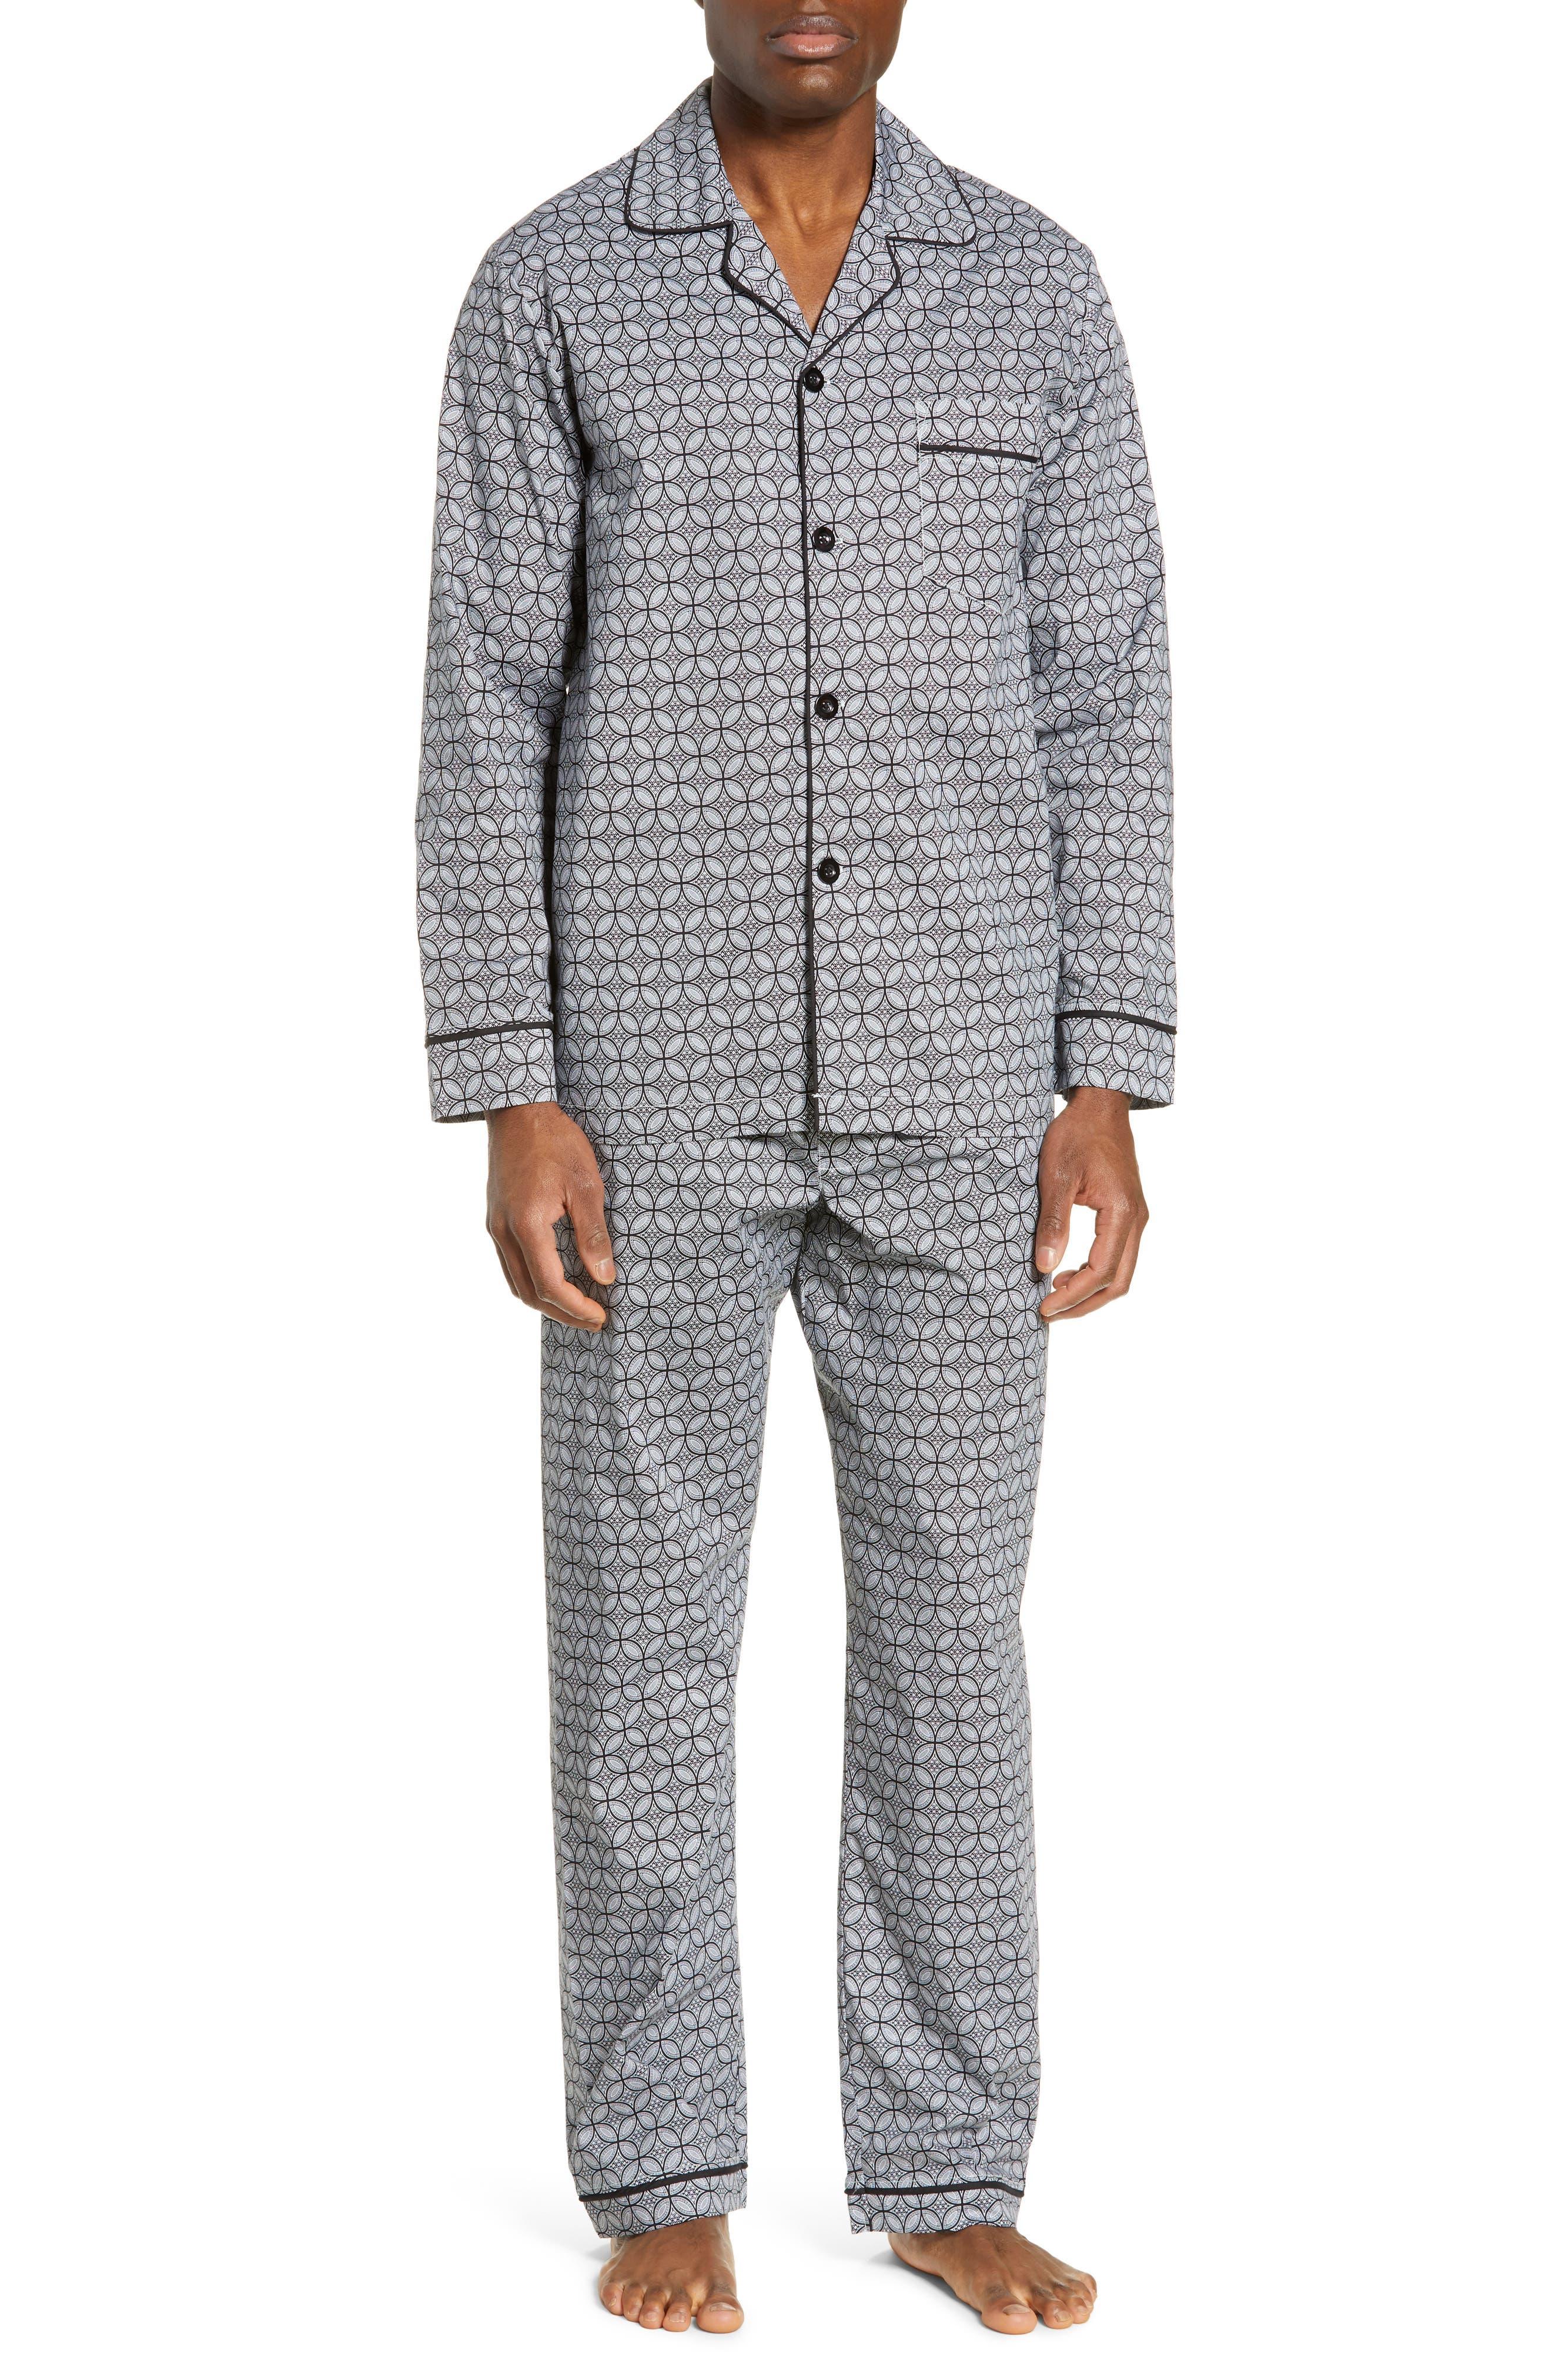 MAJESTIC INTERNATIONAL, Marbella Stretch Sateen Pajamas, Main thumbnail 1, color, BLACK